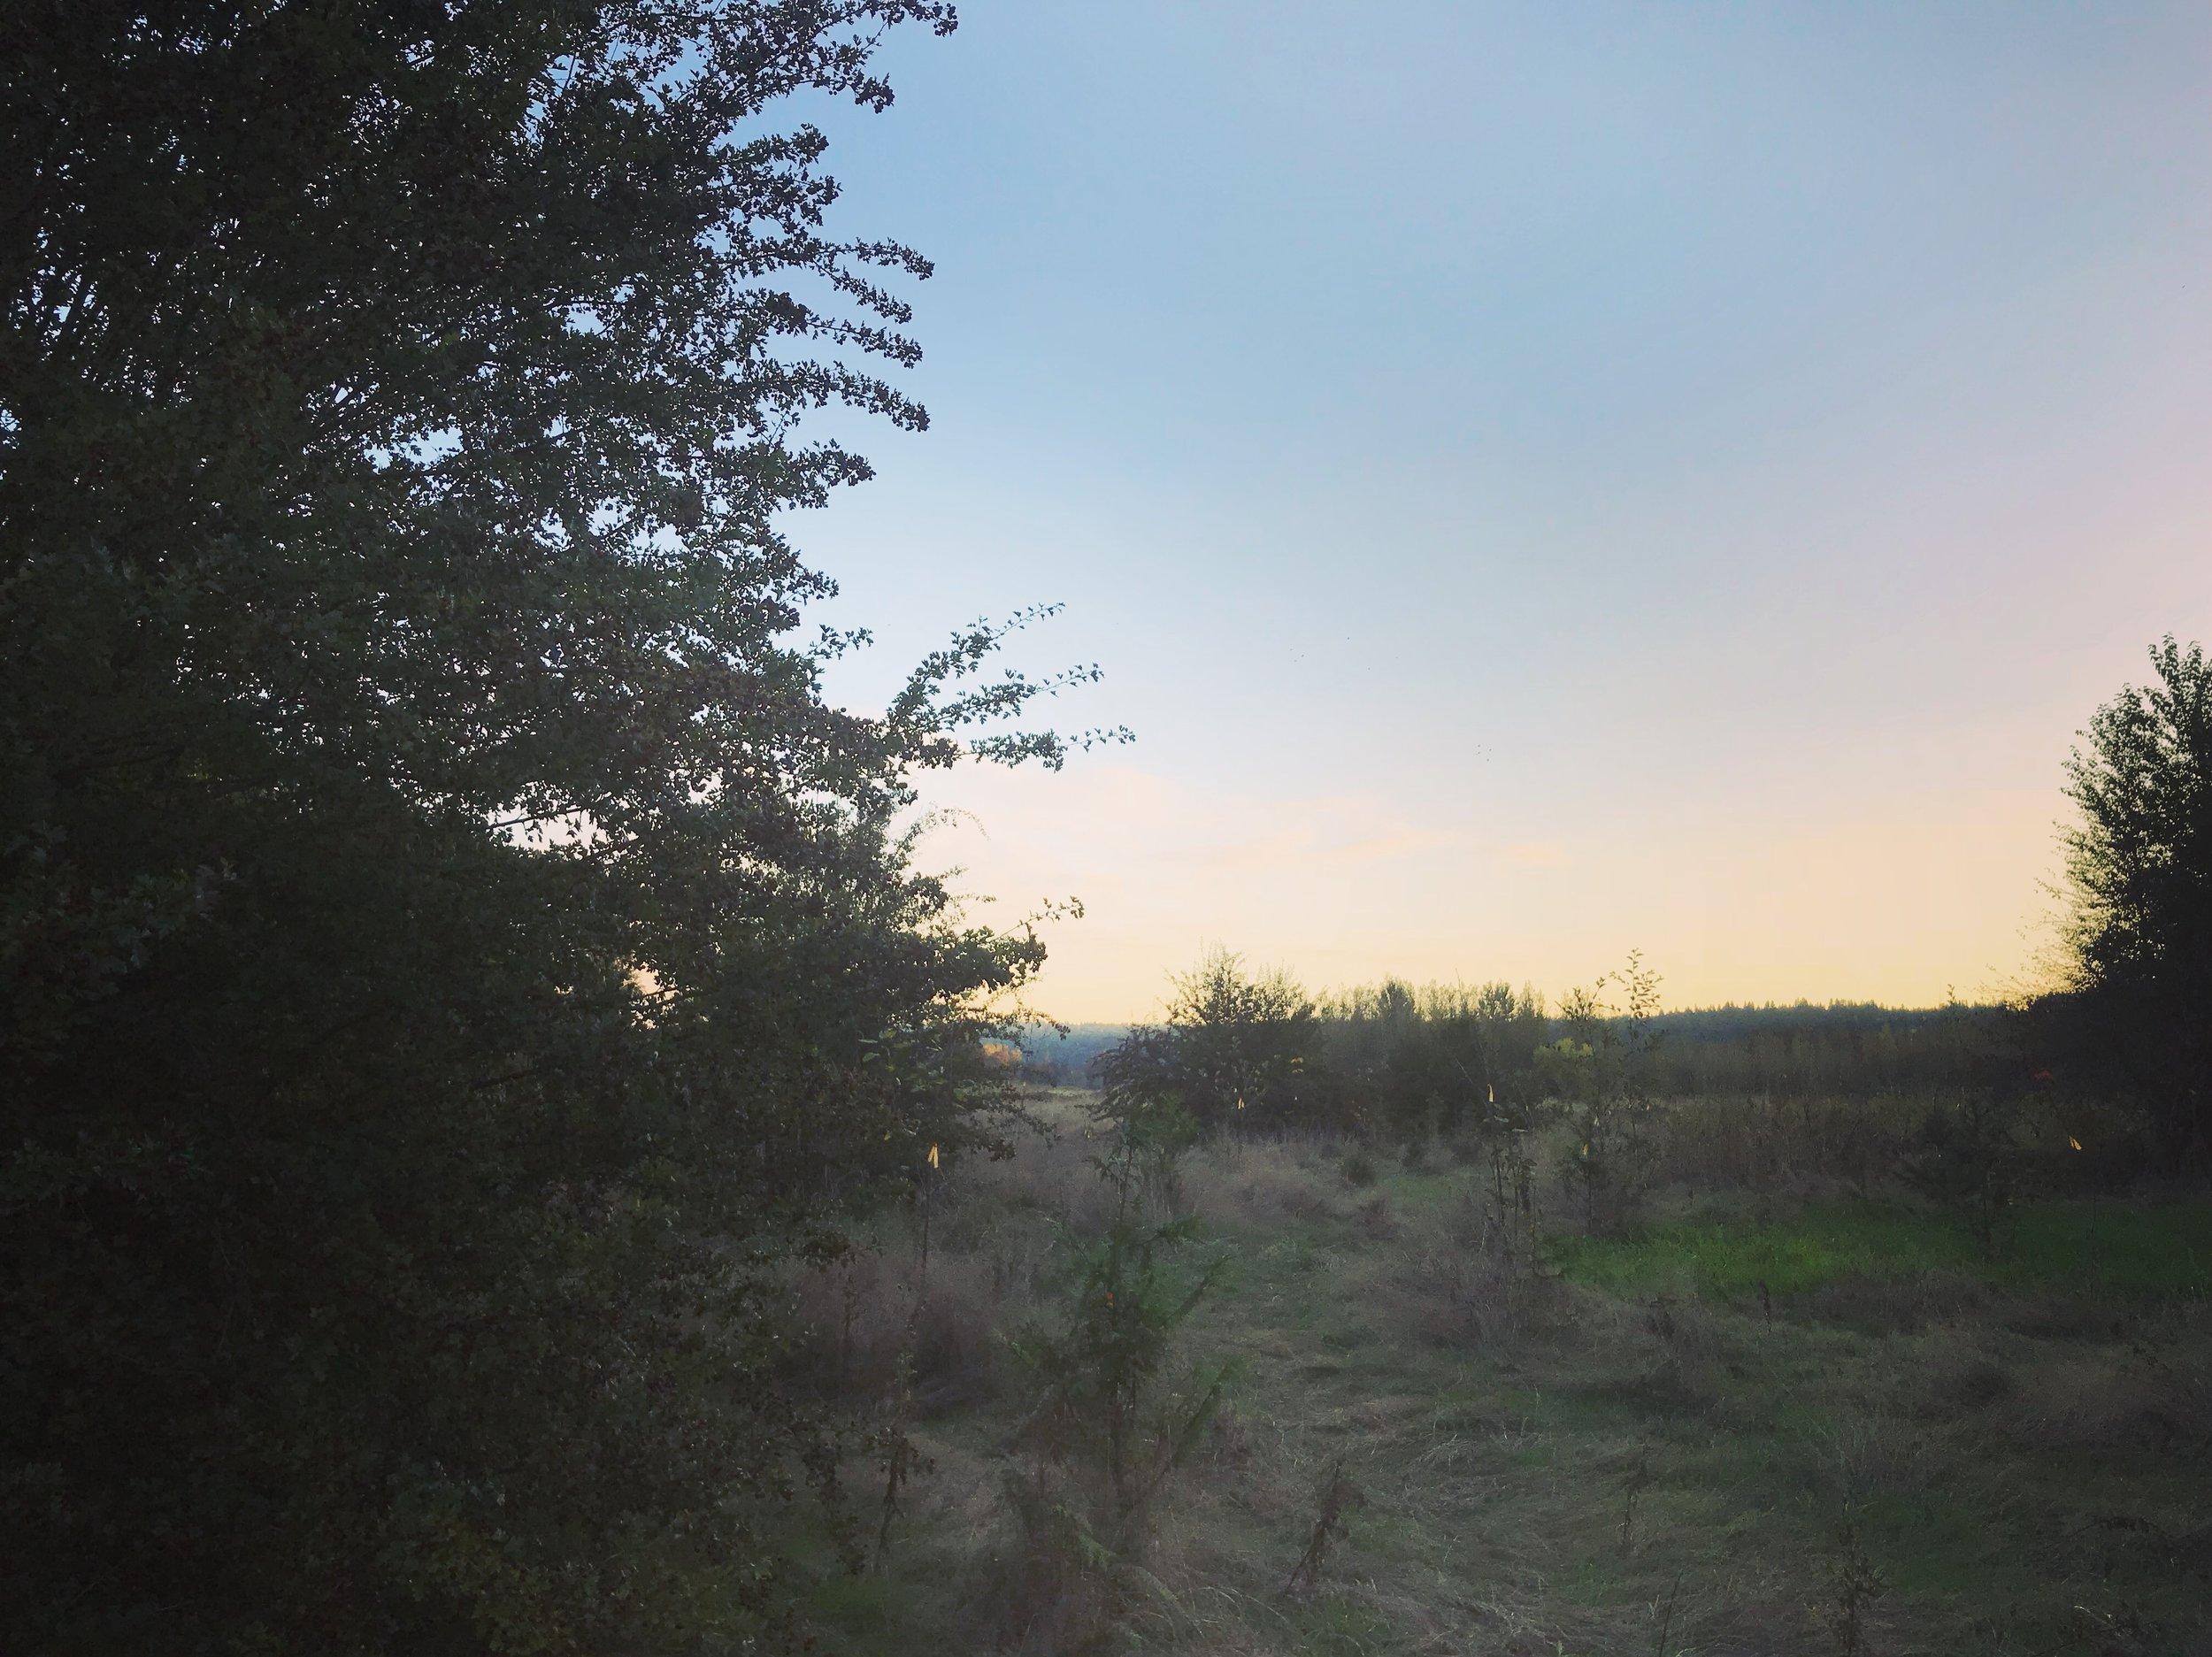 Harvesting berries at Sunset